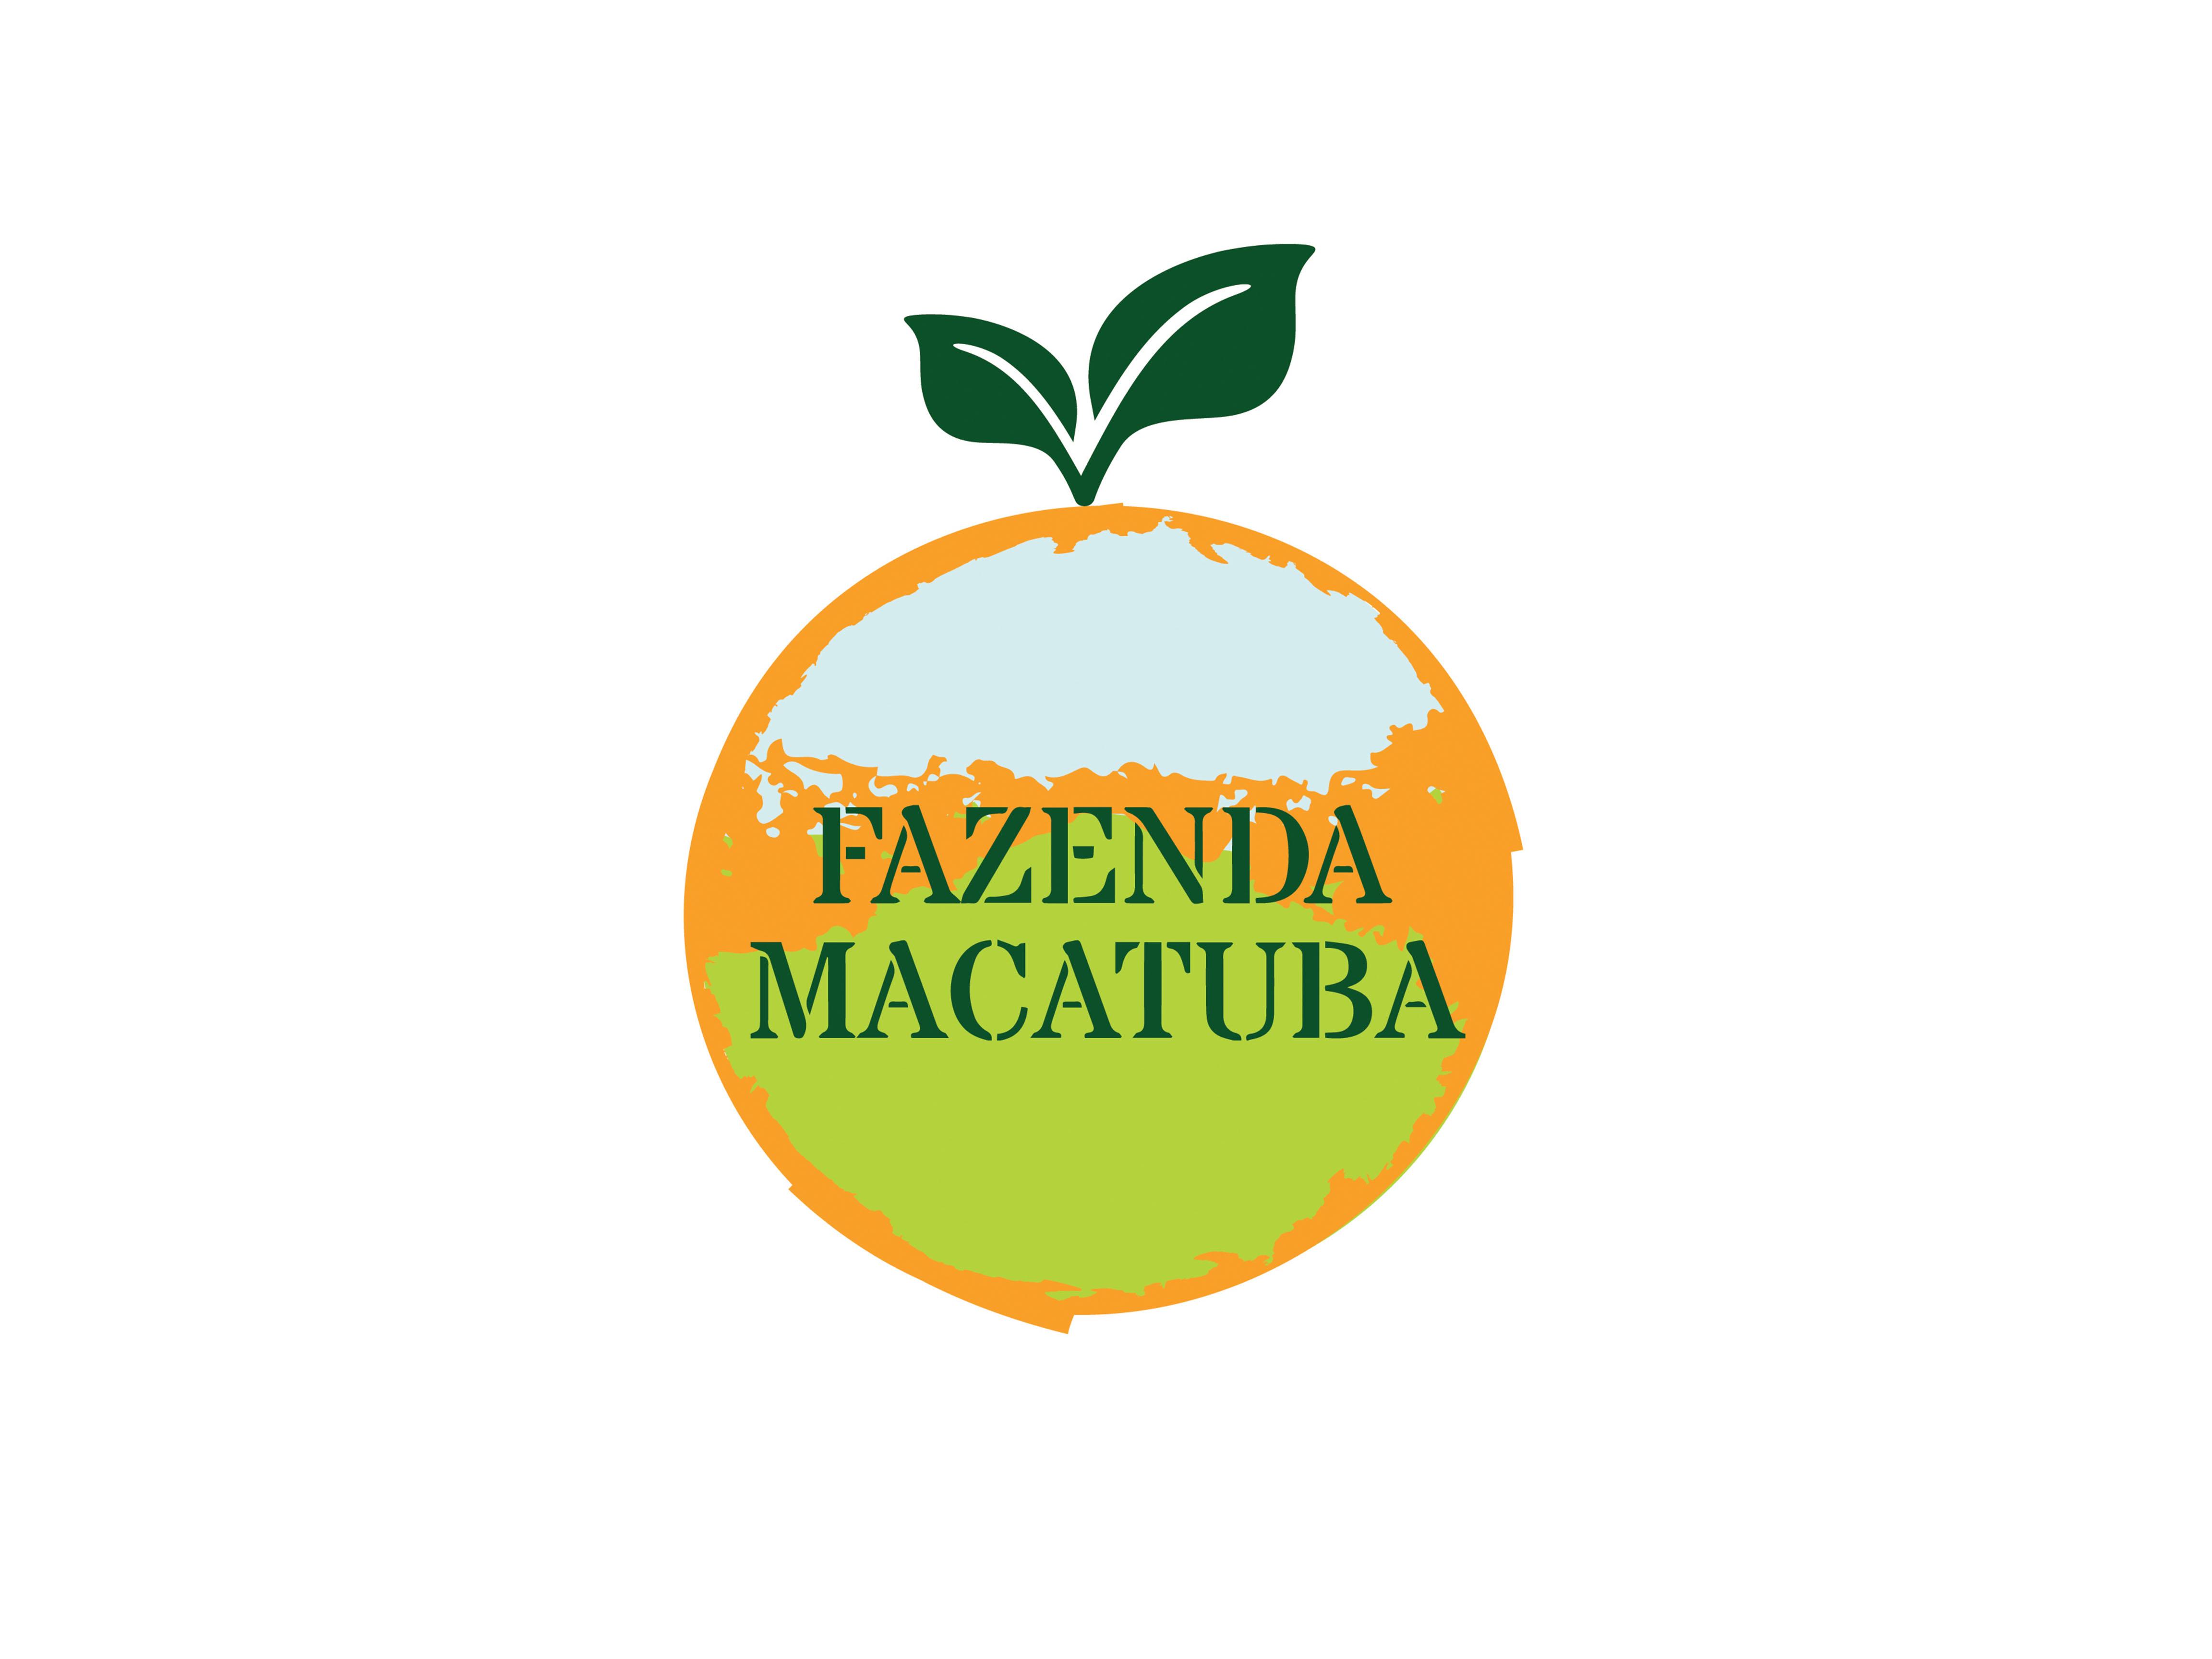 Fazenda Macatuba | logo